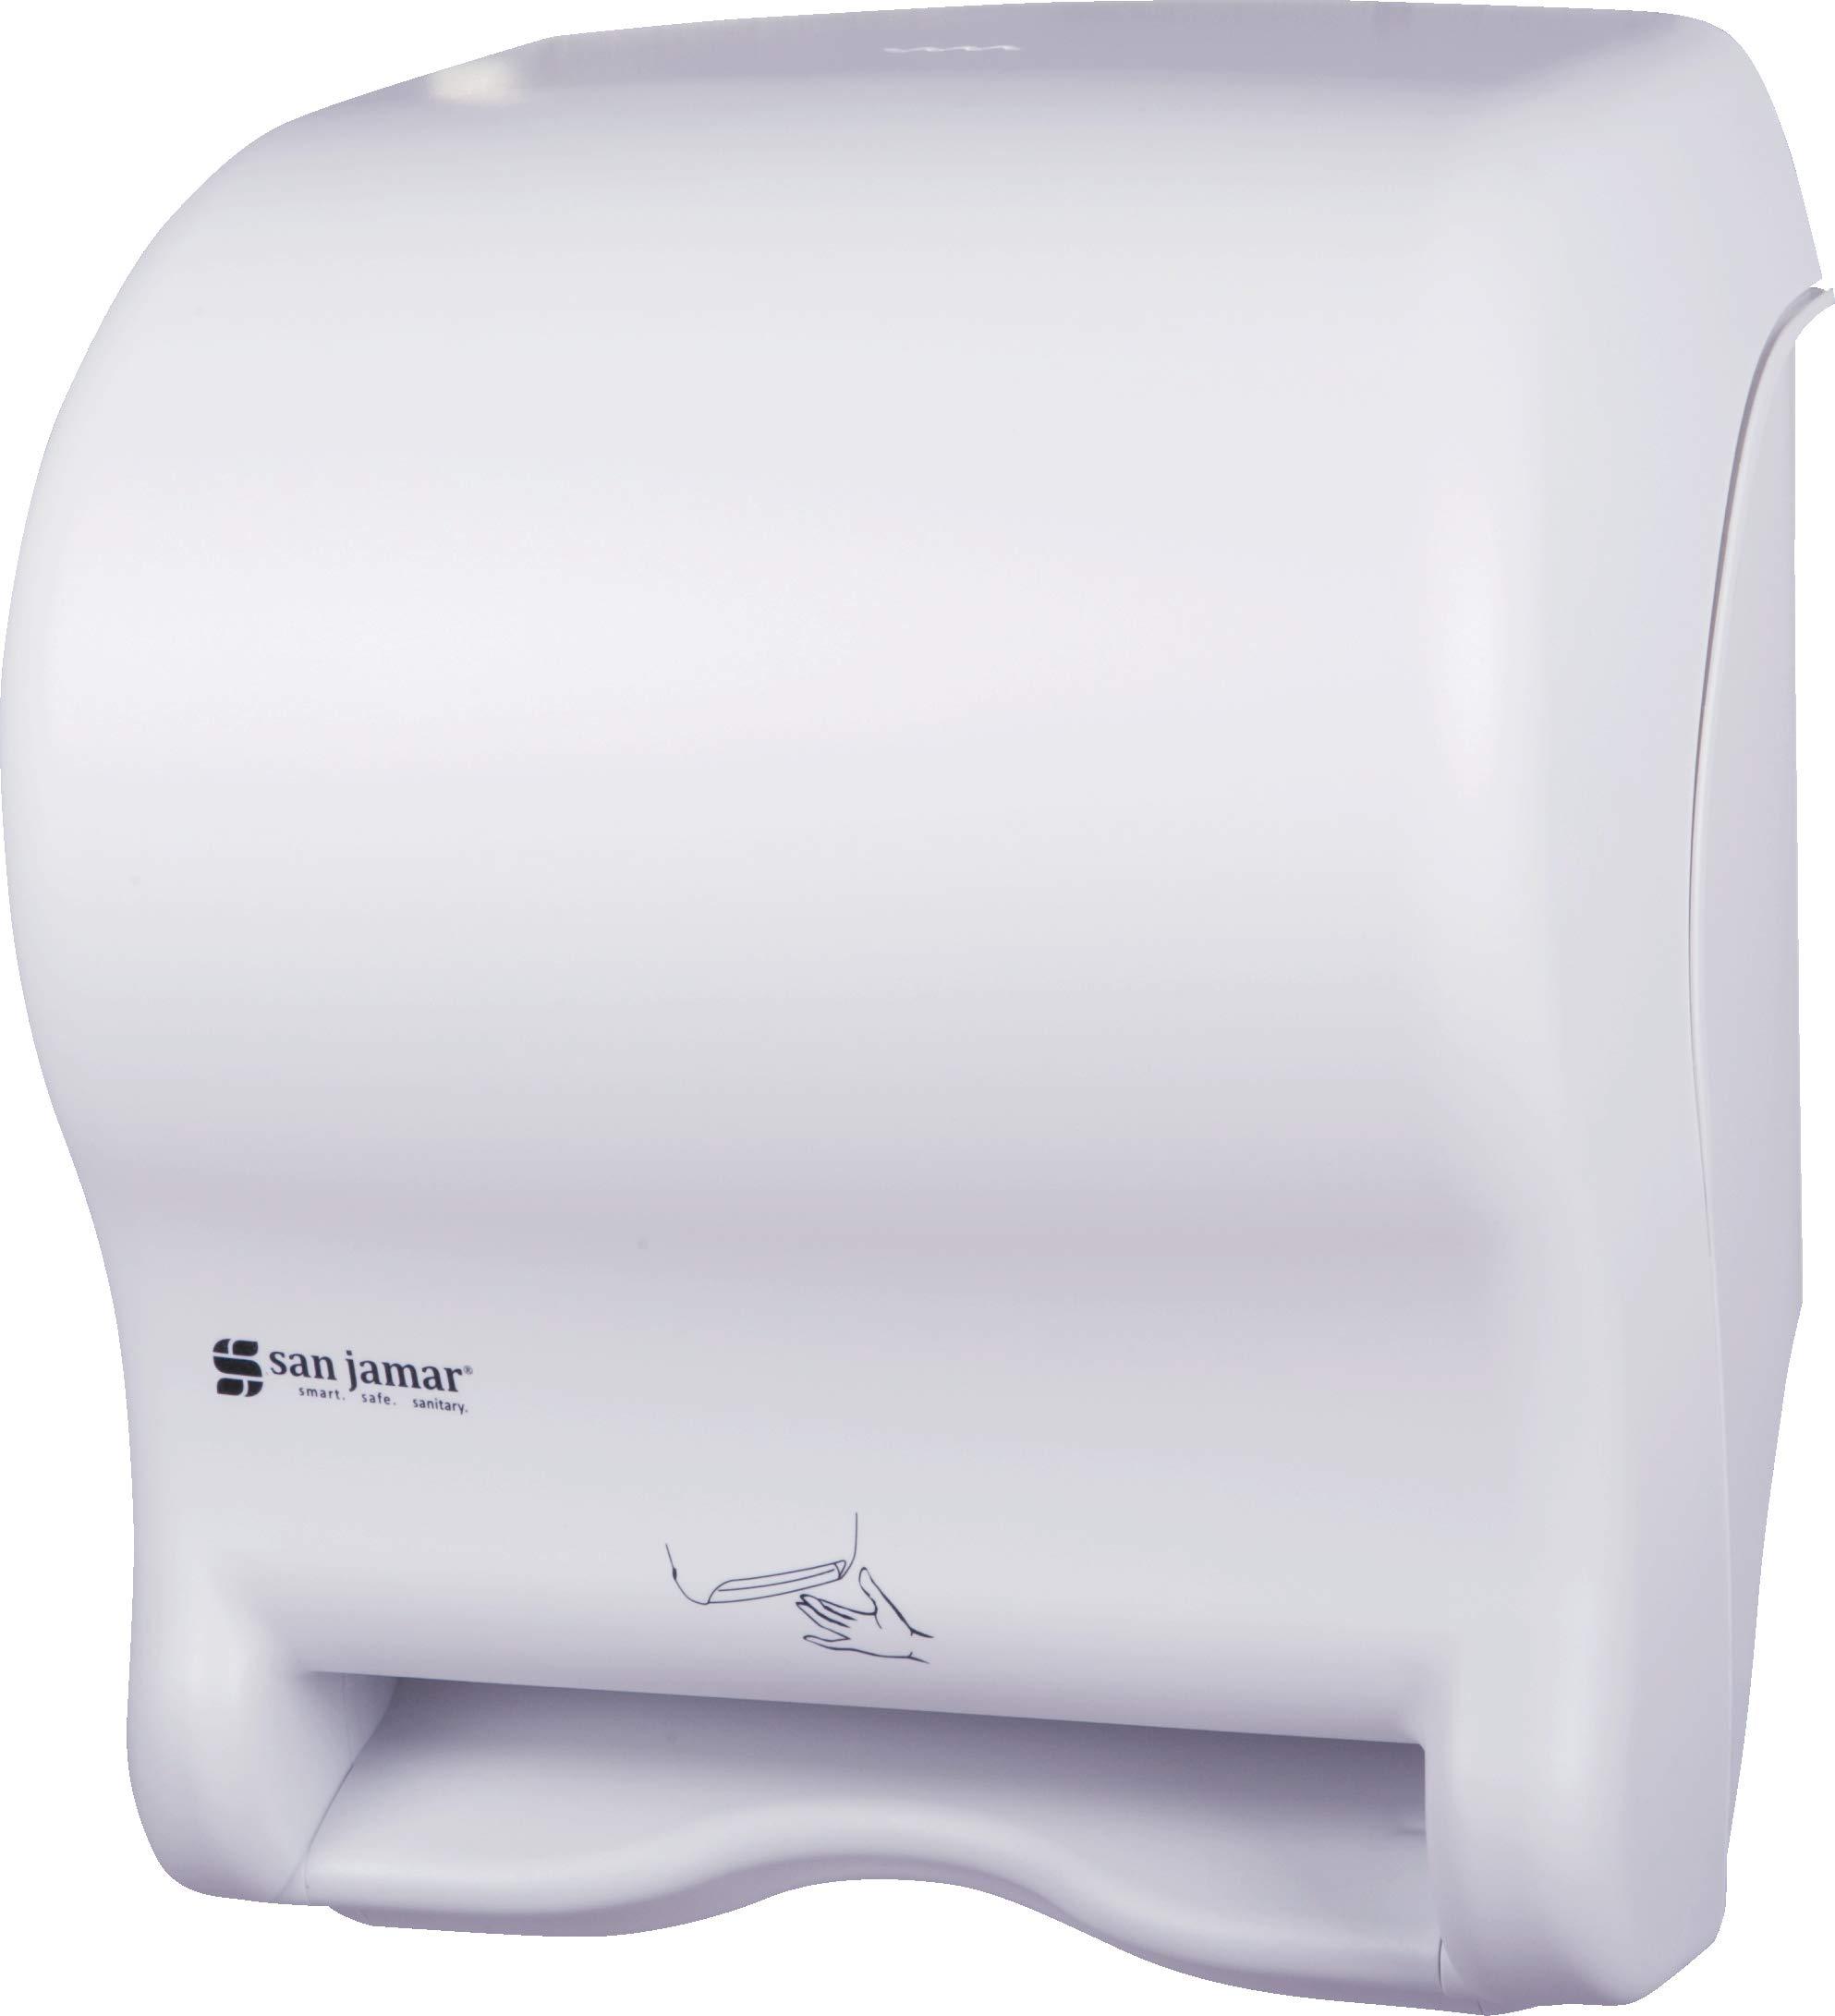 San Jamar T8400WH Smart Essence Classic Hands Free Paper Towel Dispenser, White